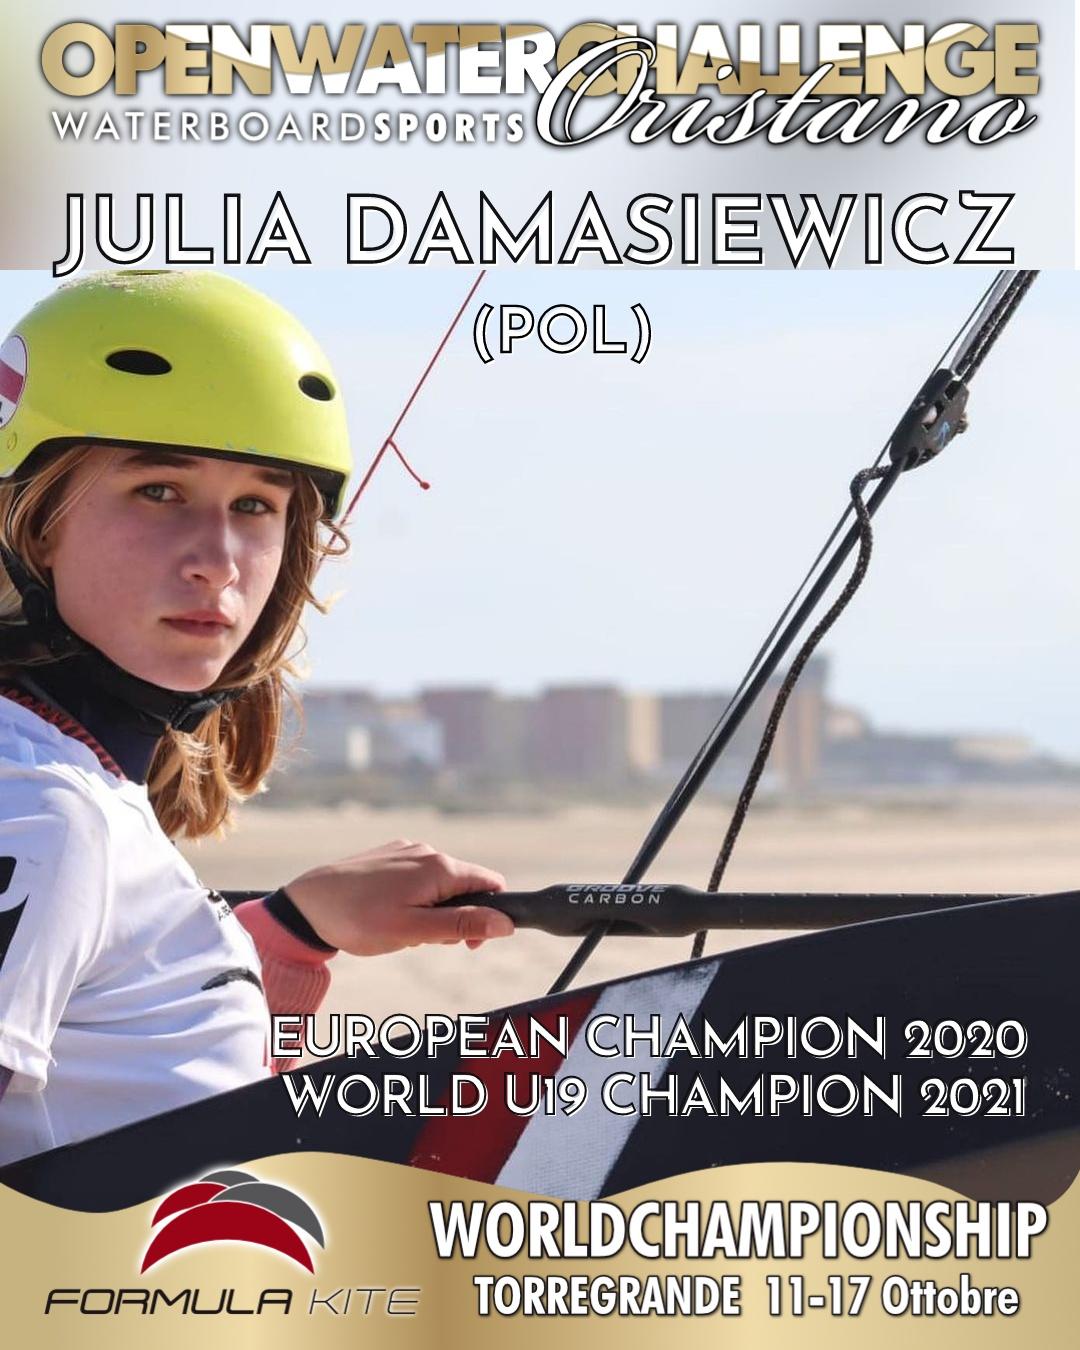 Julia Damasiewicz (POL)